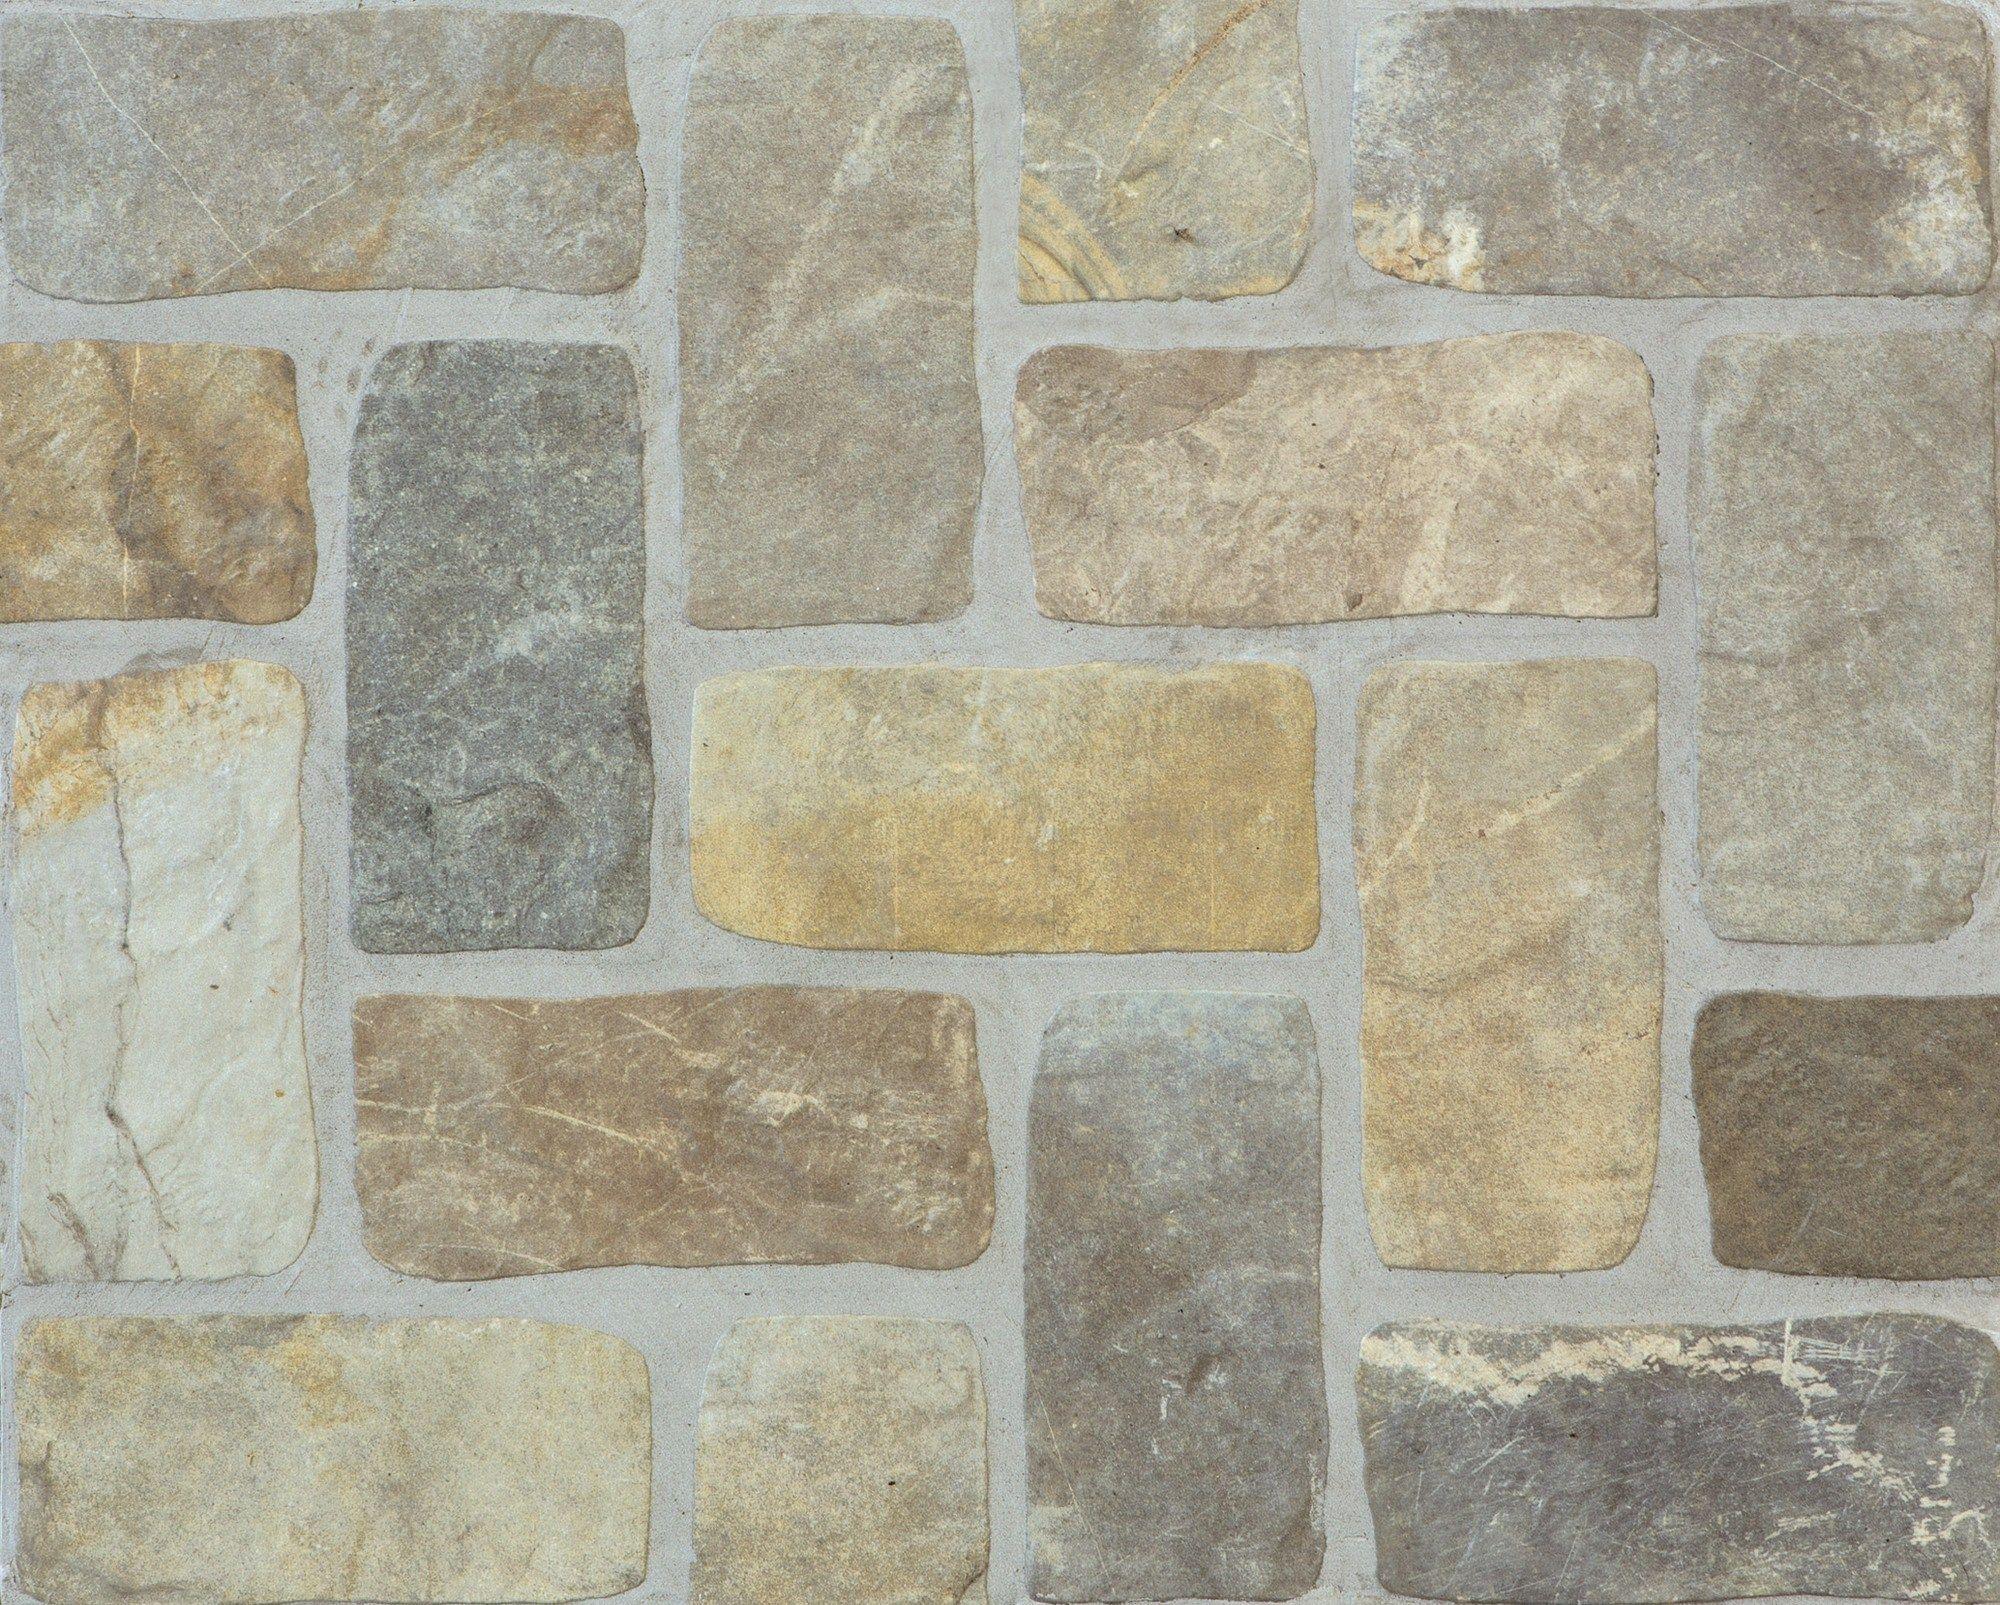 Muri in pietra interni finest per muri cucina latest idee - Sassi decorativi per interni ...